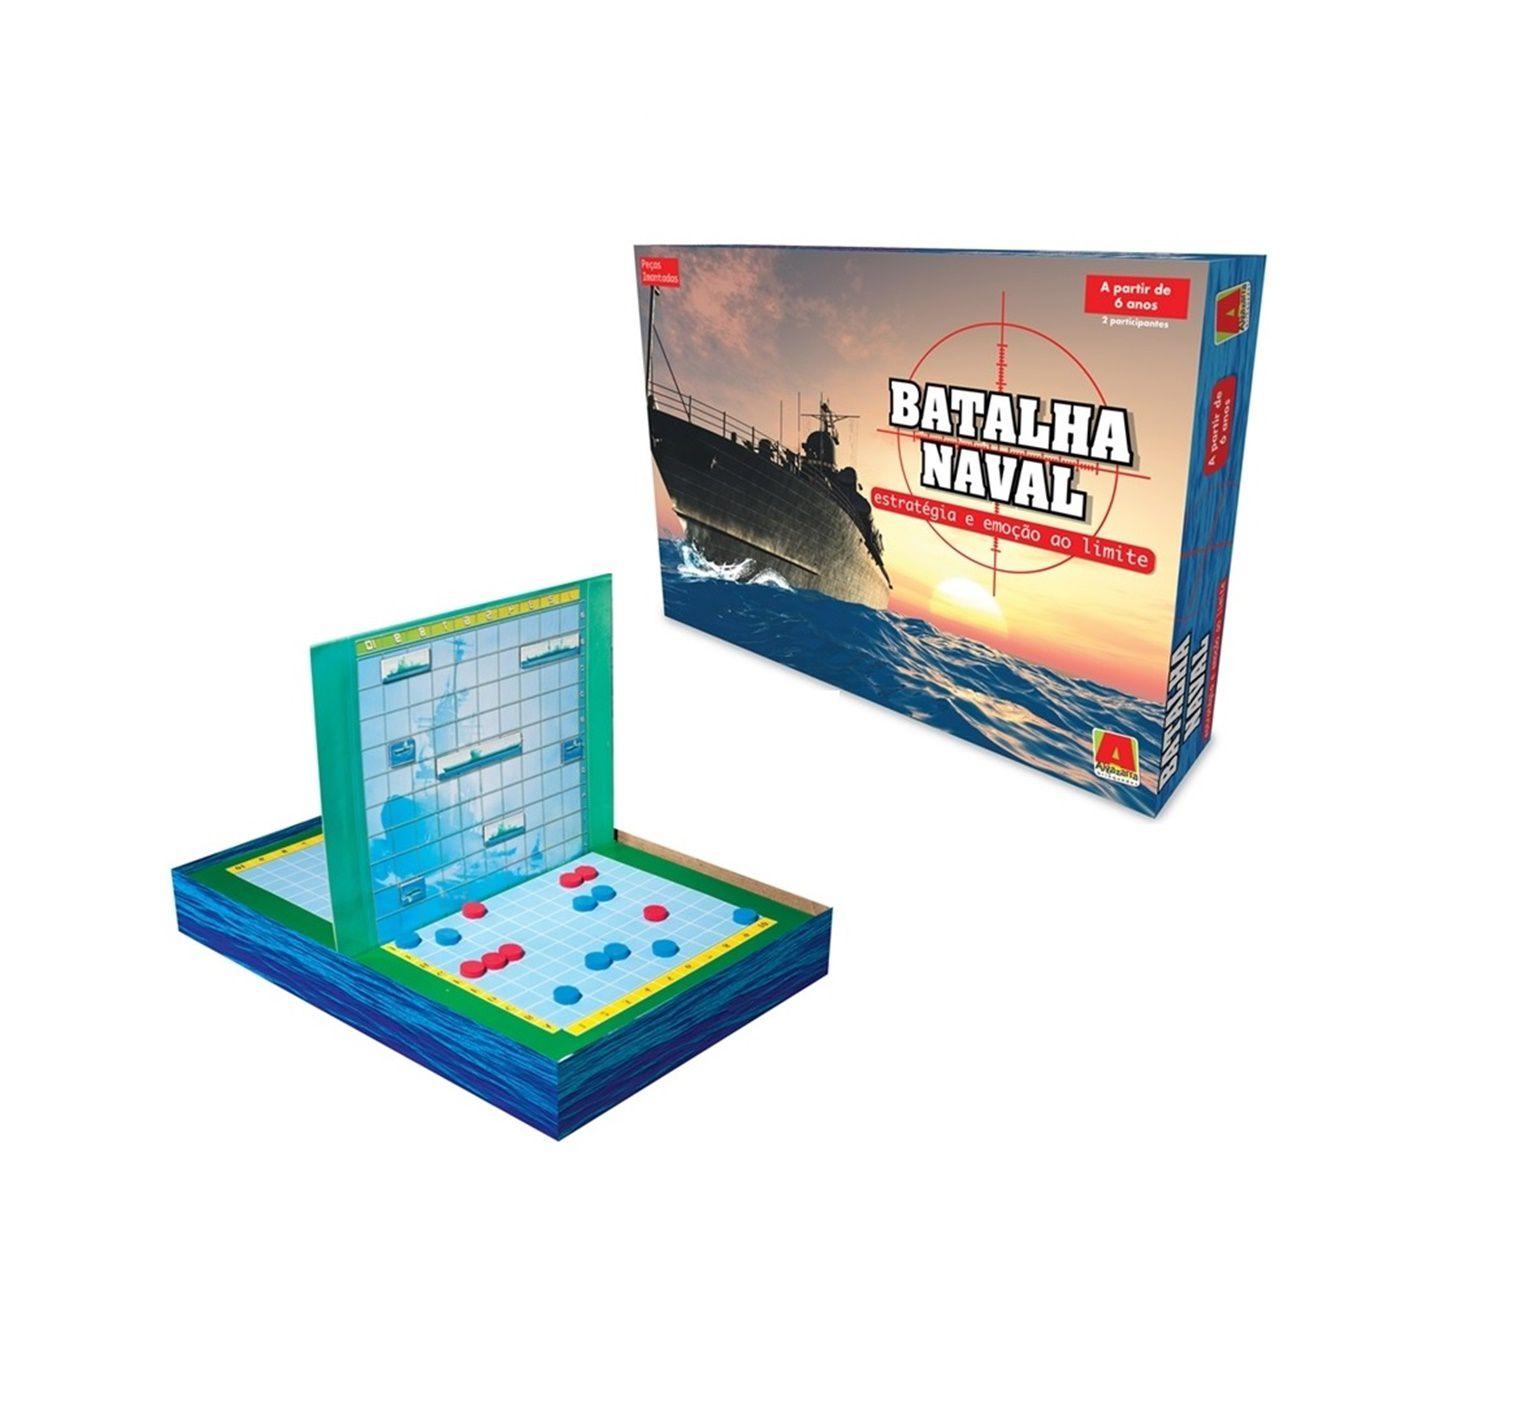 Jogo Batalha Naval Magnético - Algazarra